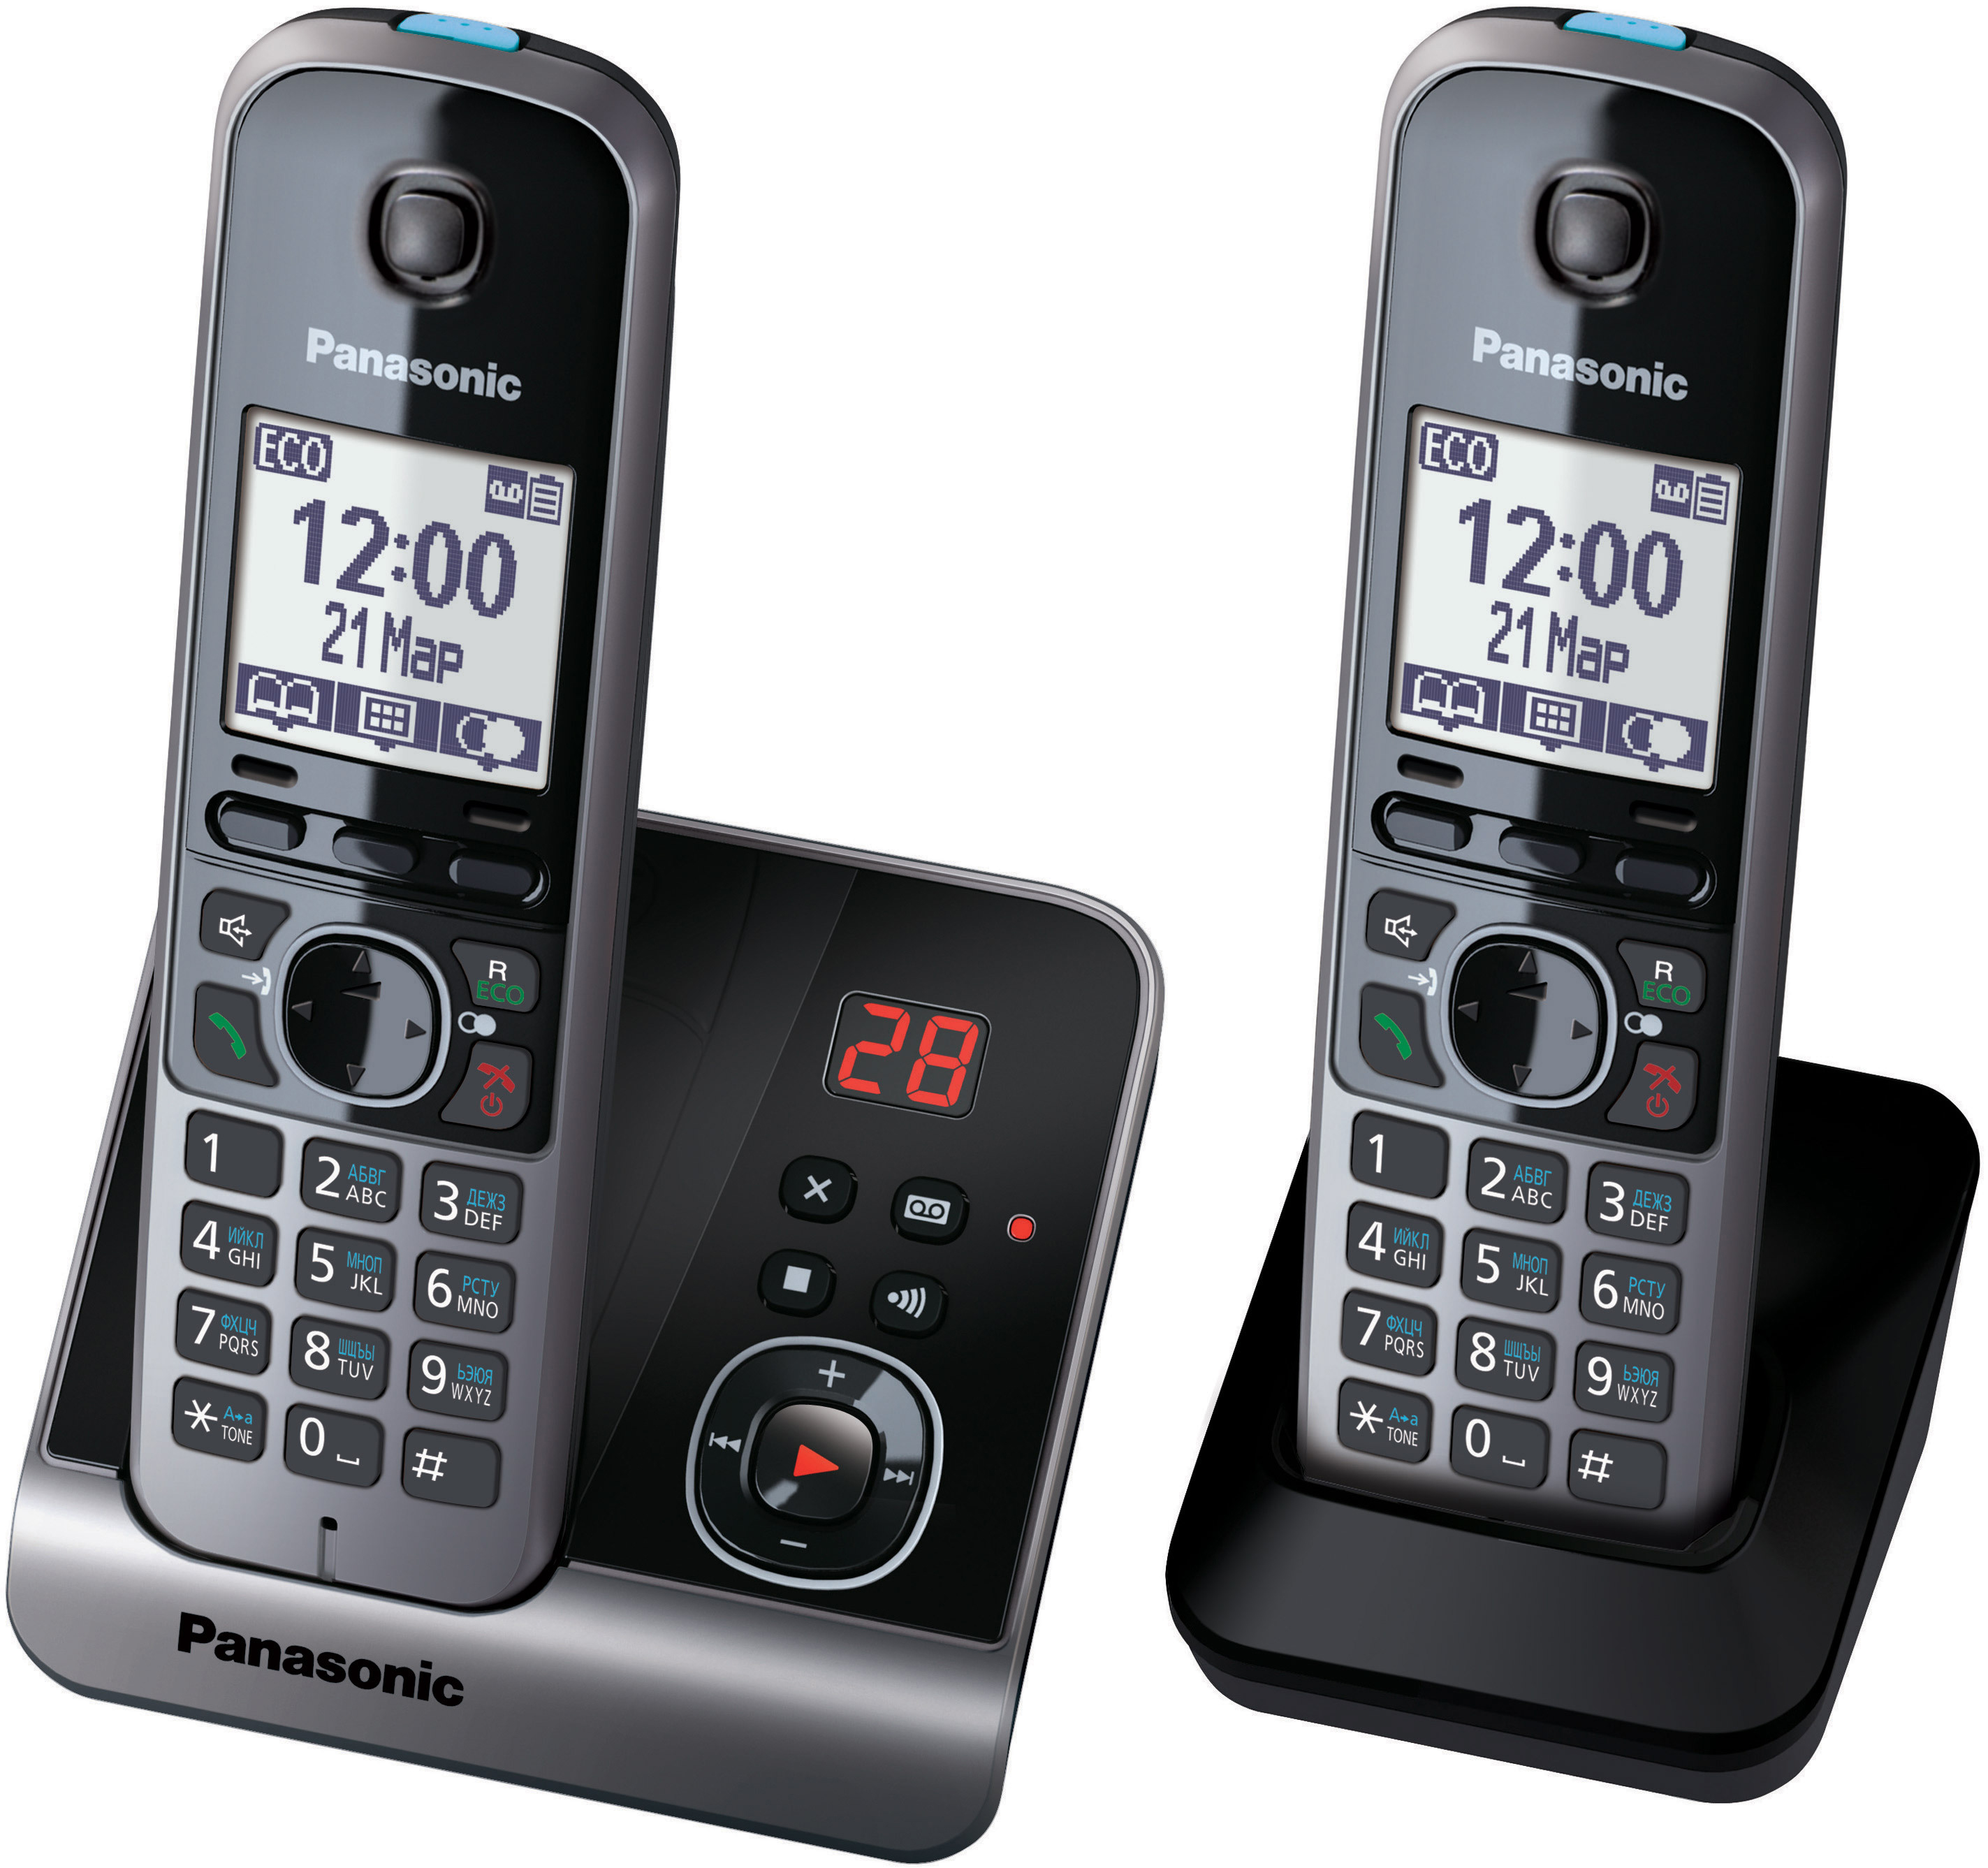 инструкция по эксплуатации телефона panasonic kx tg3711bx